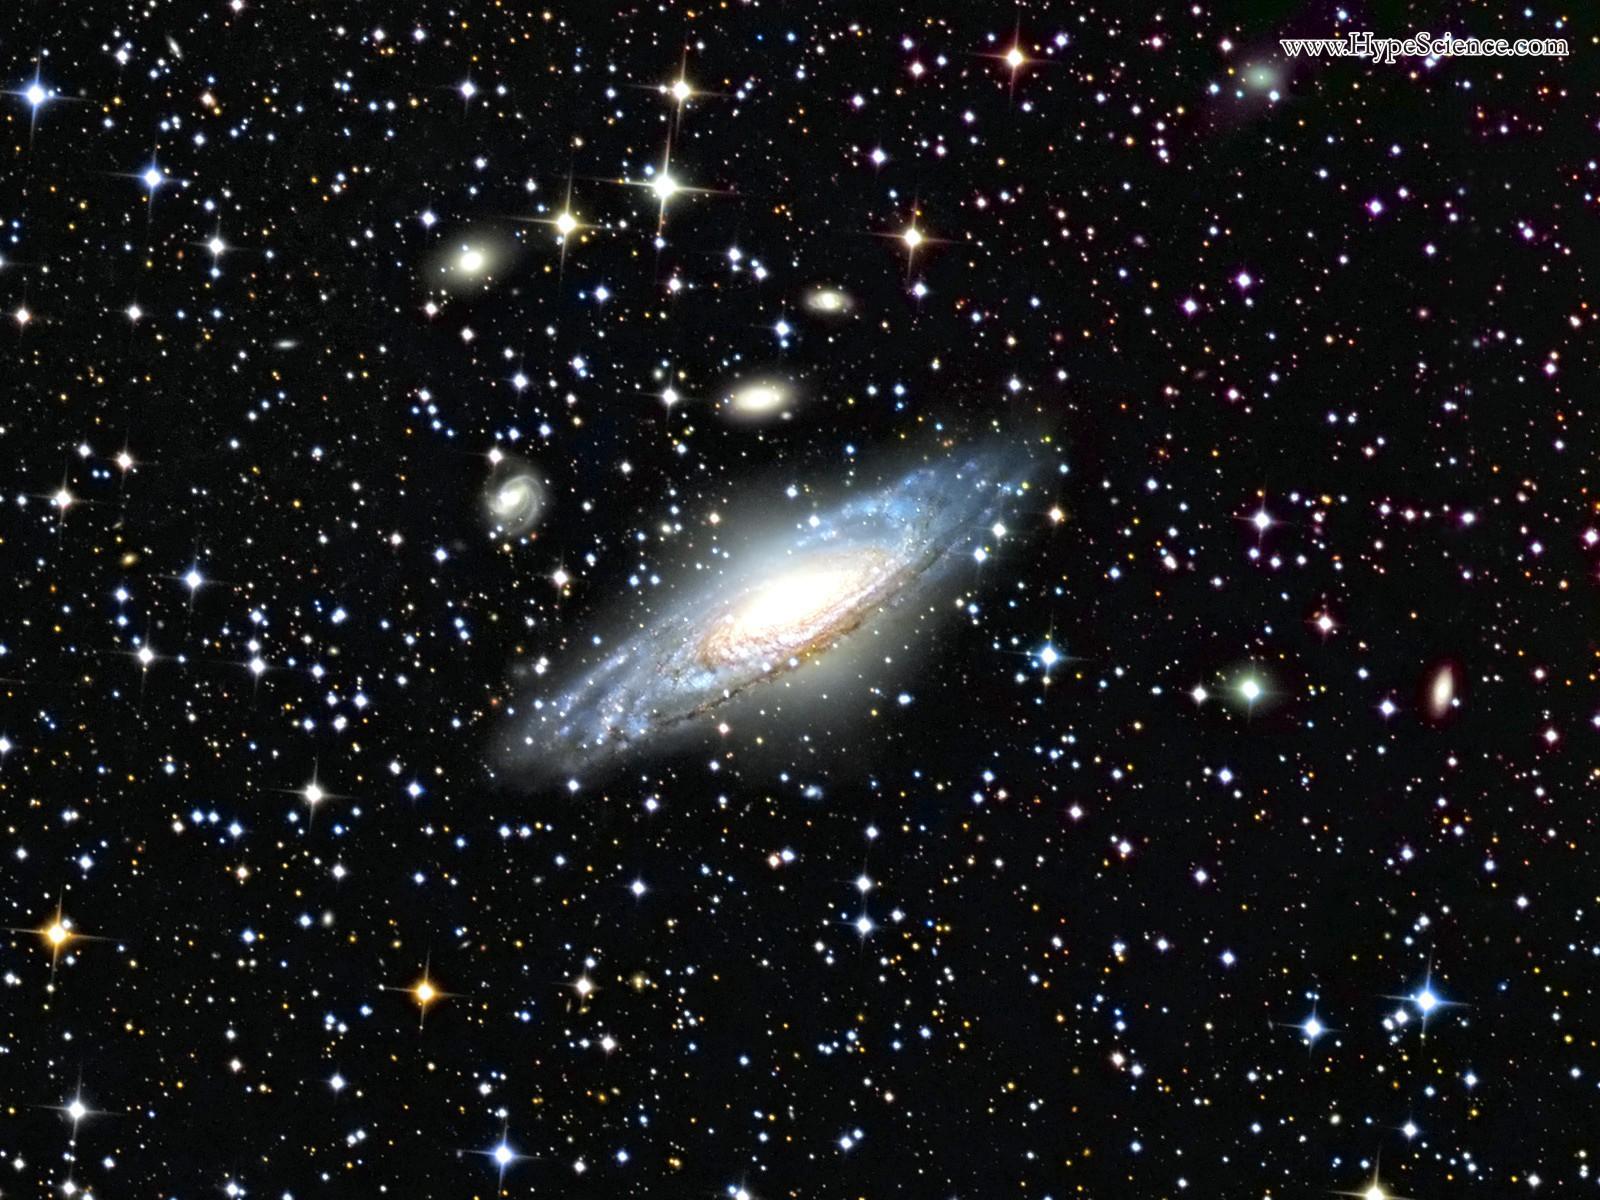 Galáxia Espiral Similar à Nossa Via Láctea [Papel De Parede]